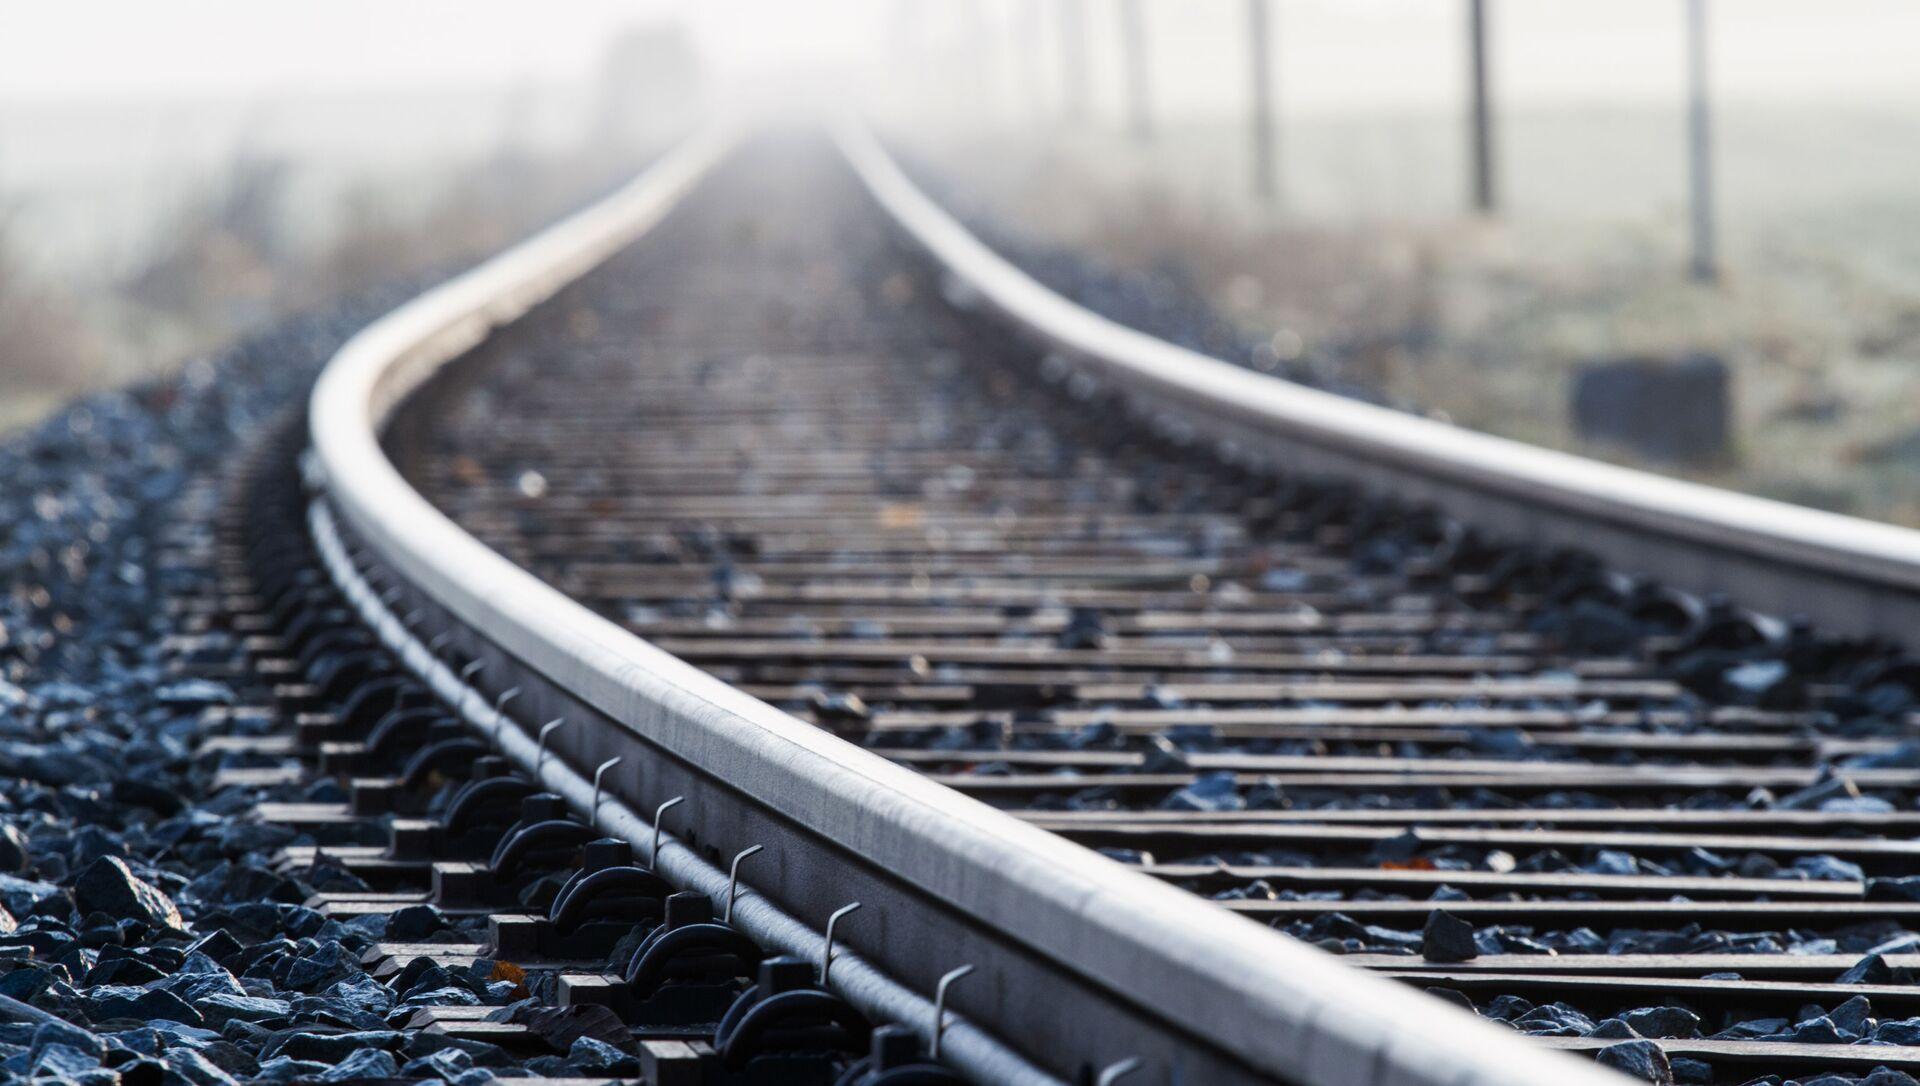 Рельсы железной дороги - Sputnik Արմենիա, 1920, 08.02.2021